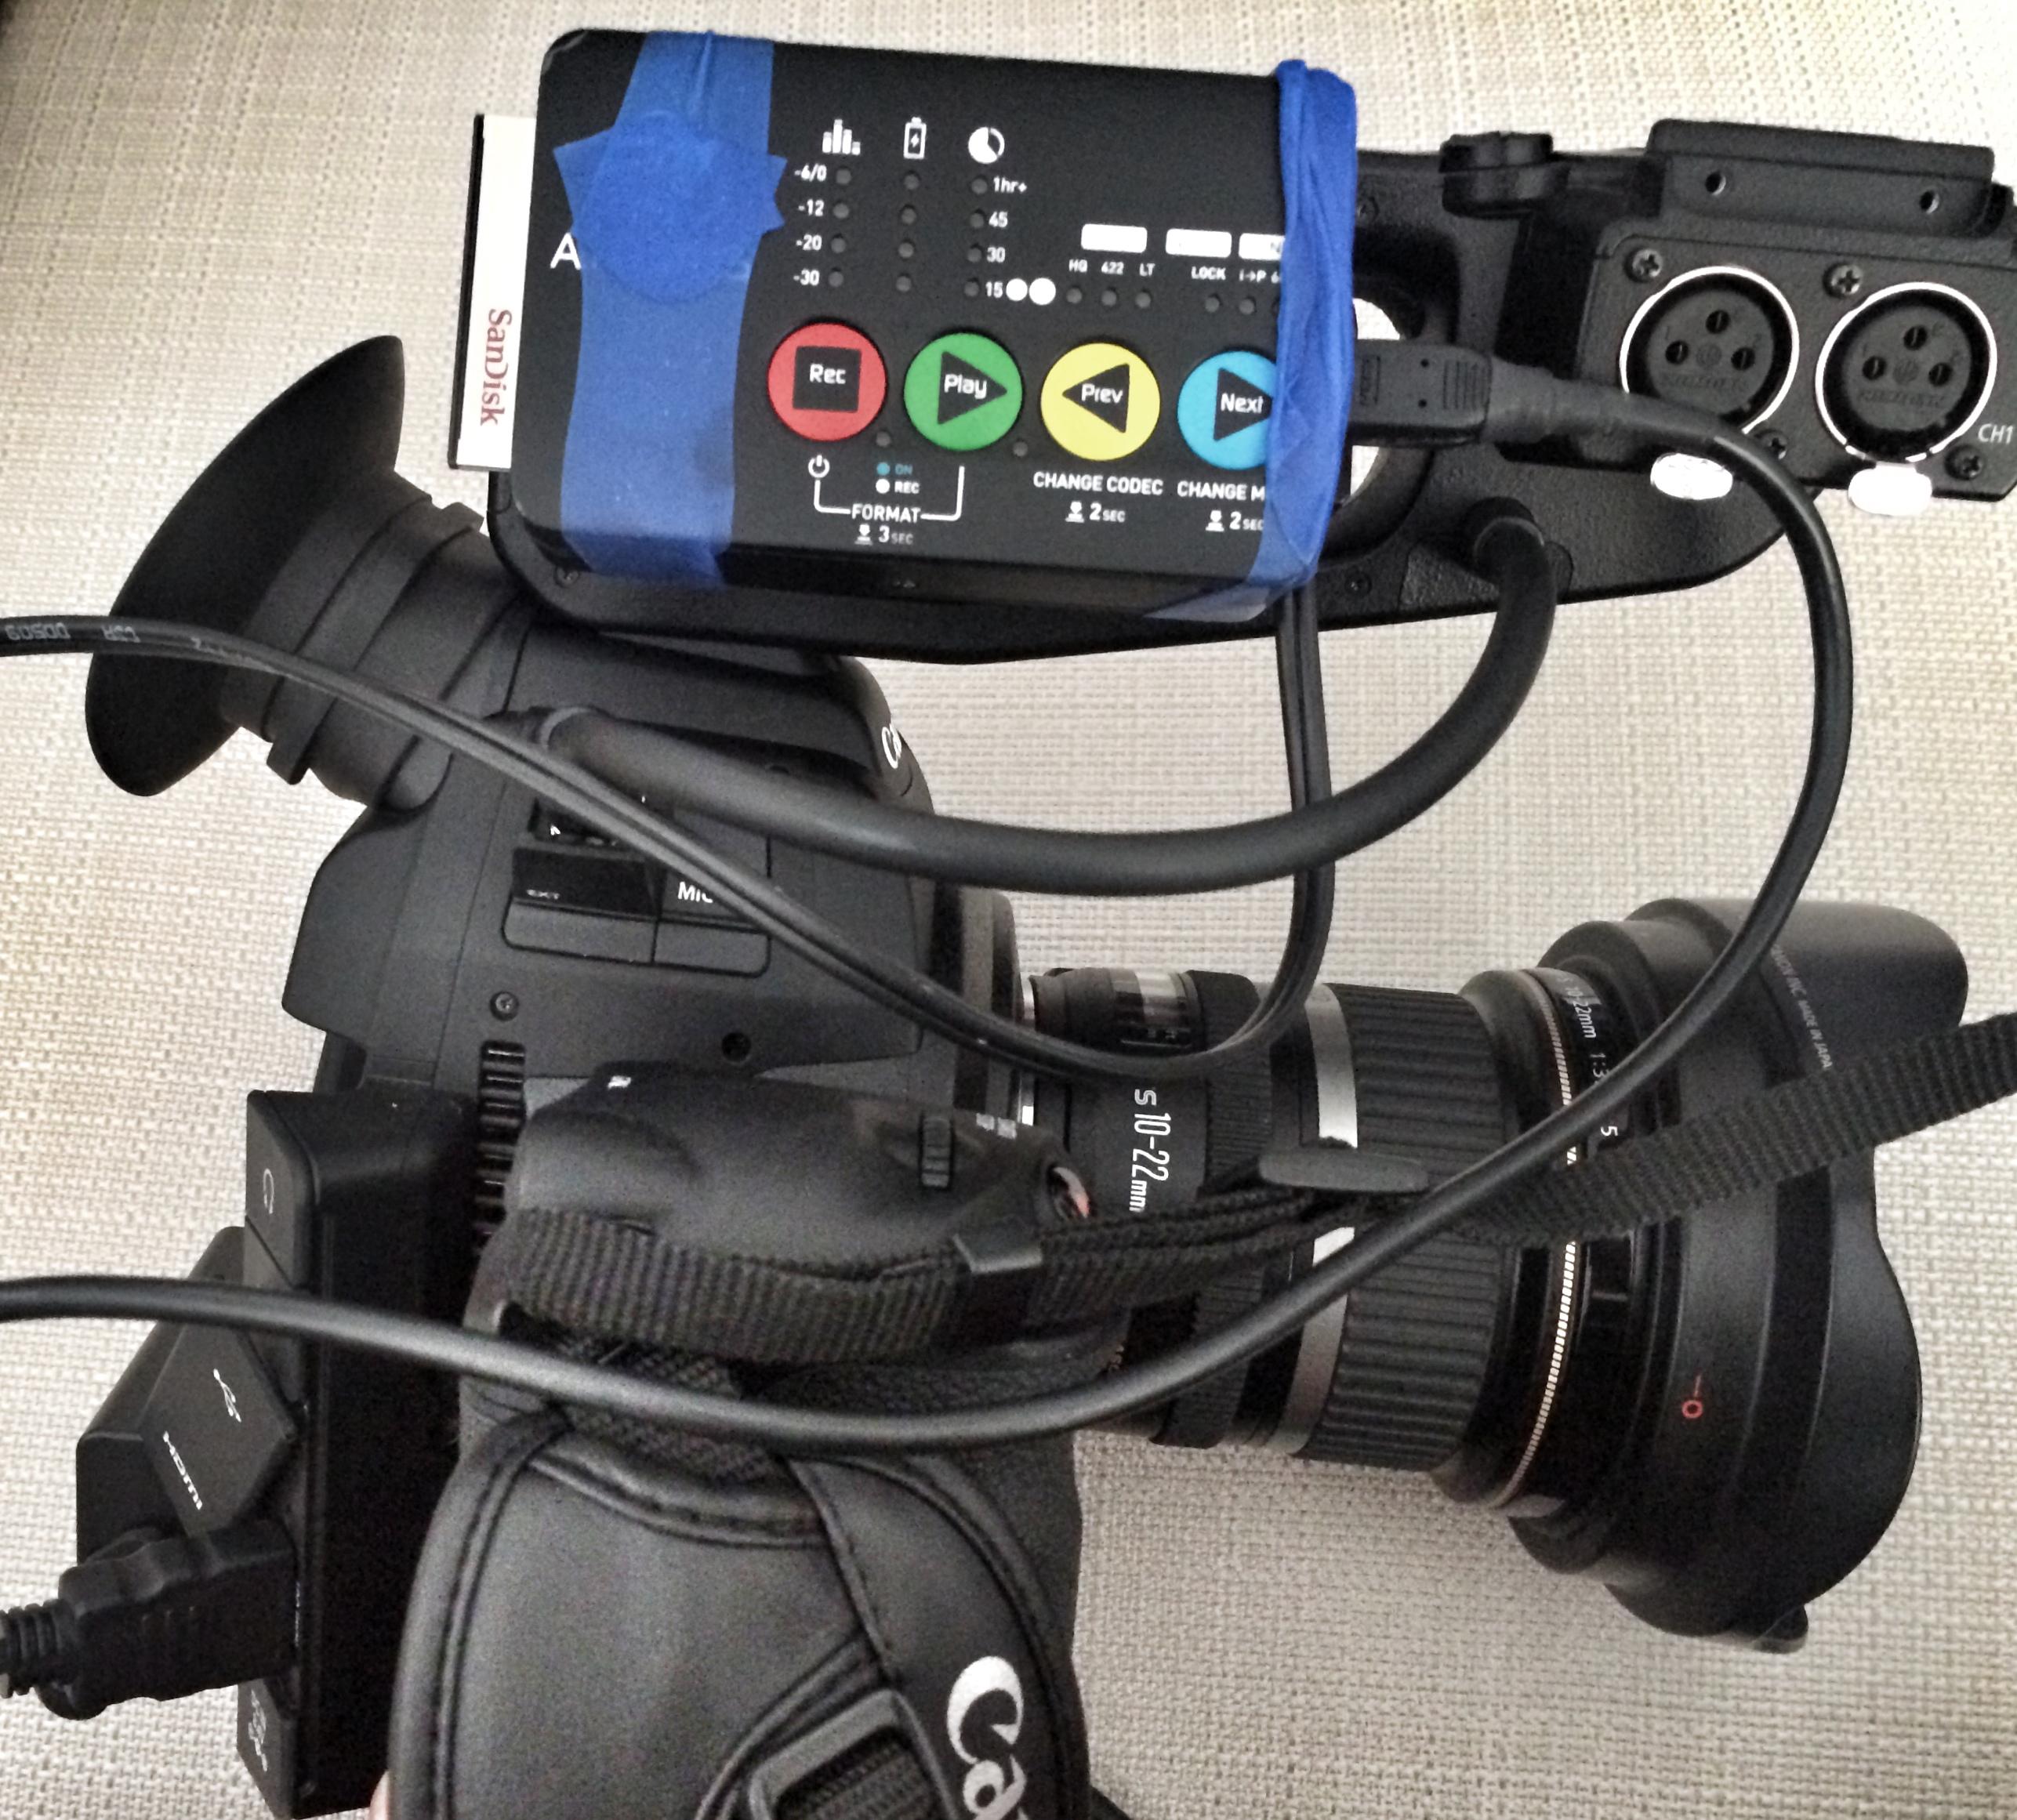 Review: Atomos Ninja Star – the near perfect recorder for run-and-gun filming